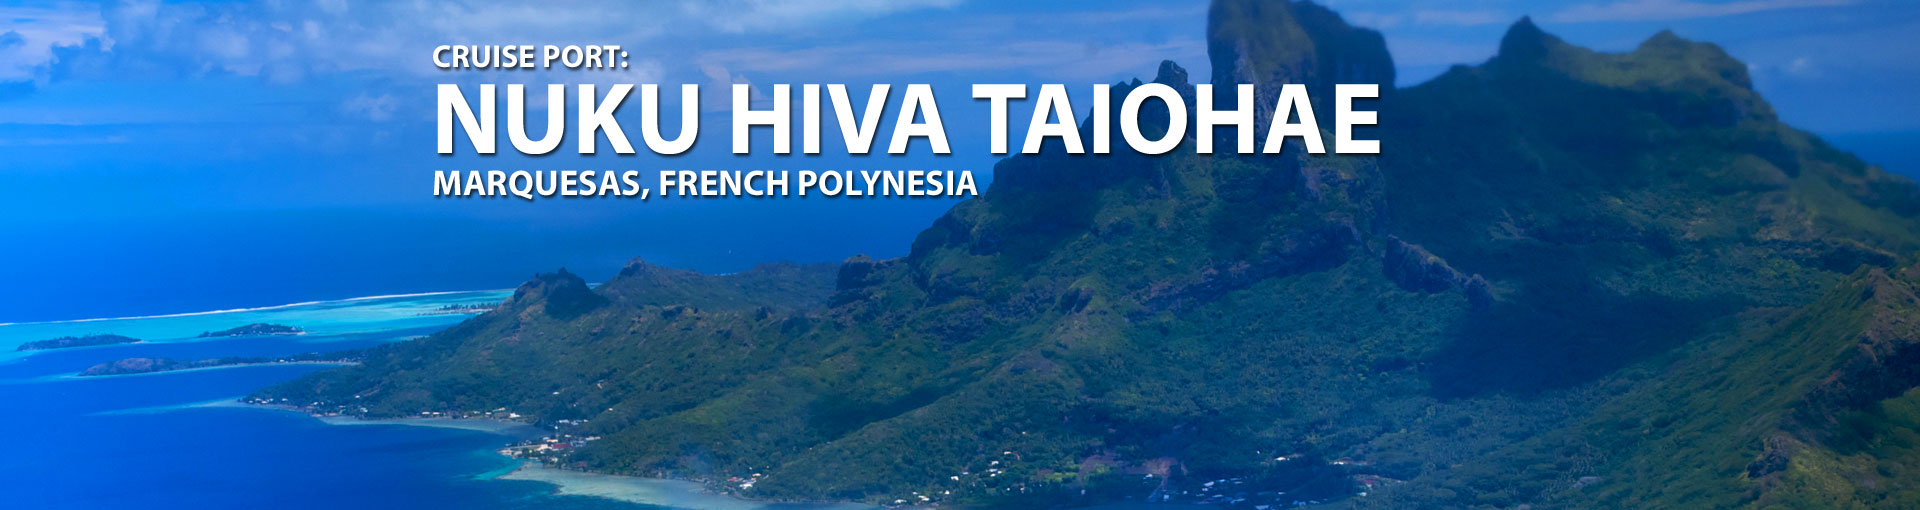 Cruises to Nuku Hiva Taiohae, Marquesas